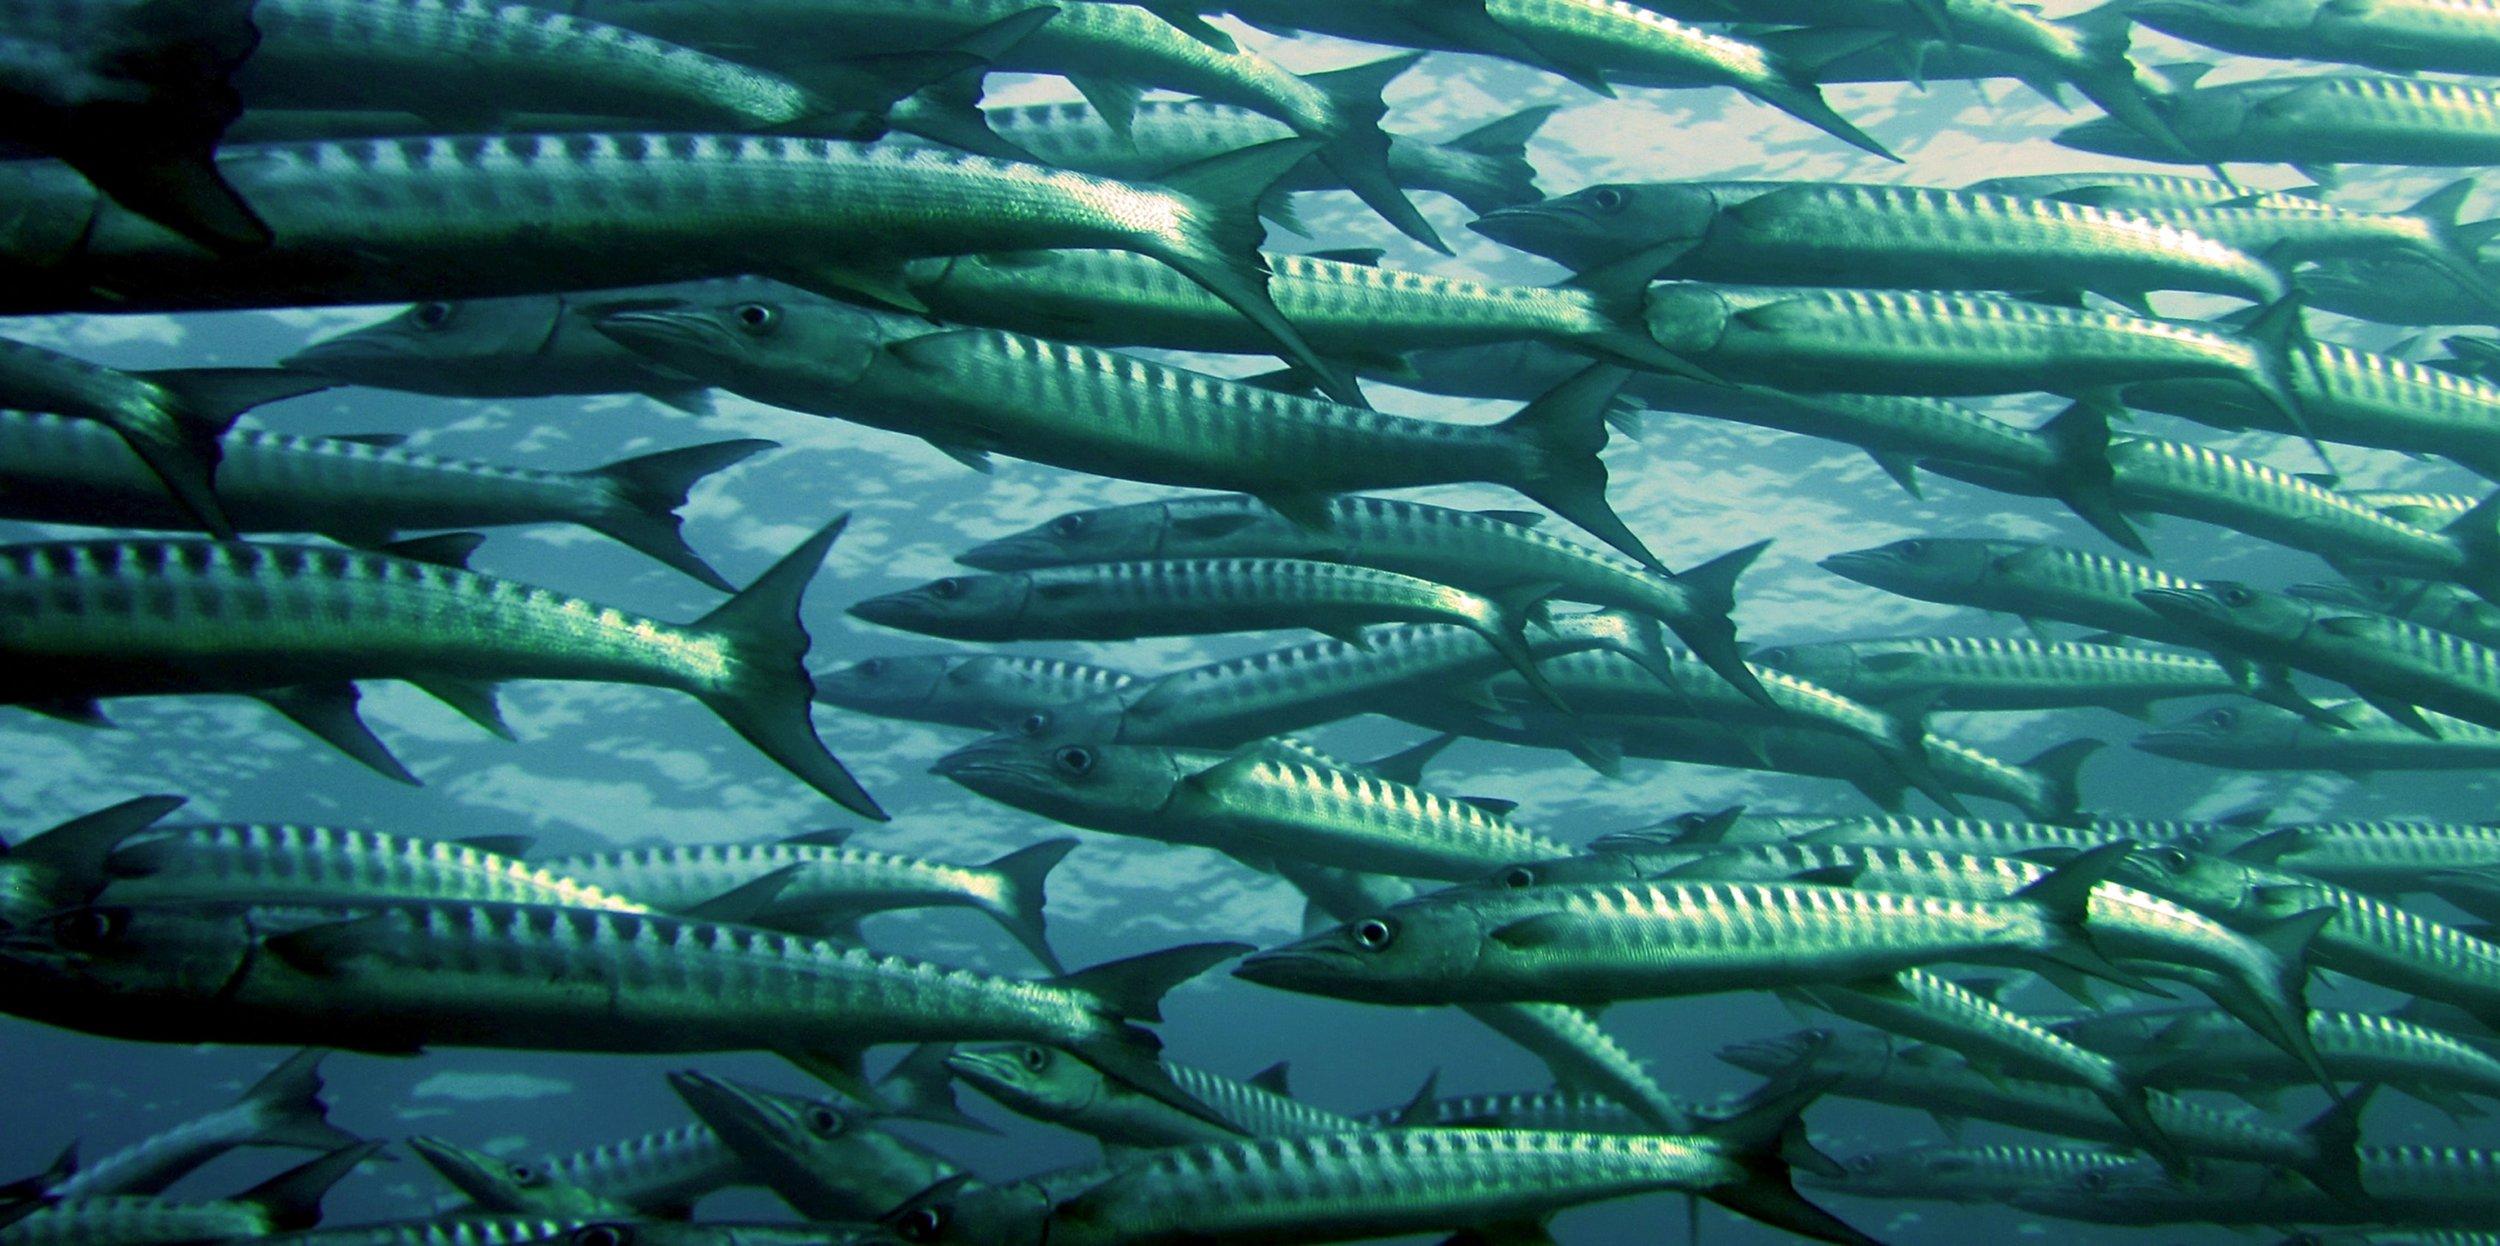 barracuda-fish-ocean-66218.jpg